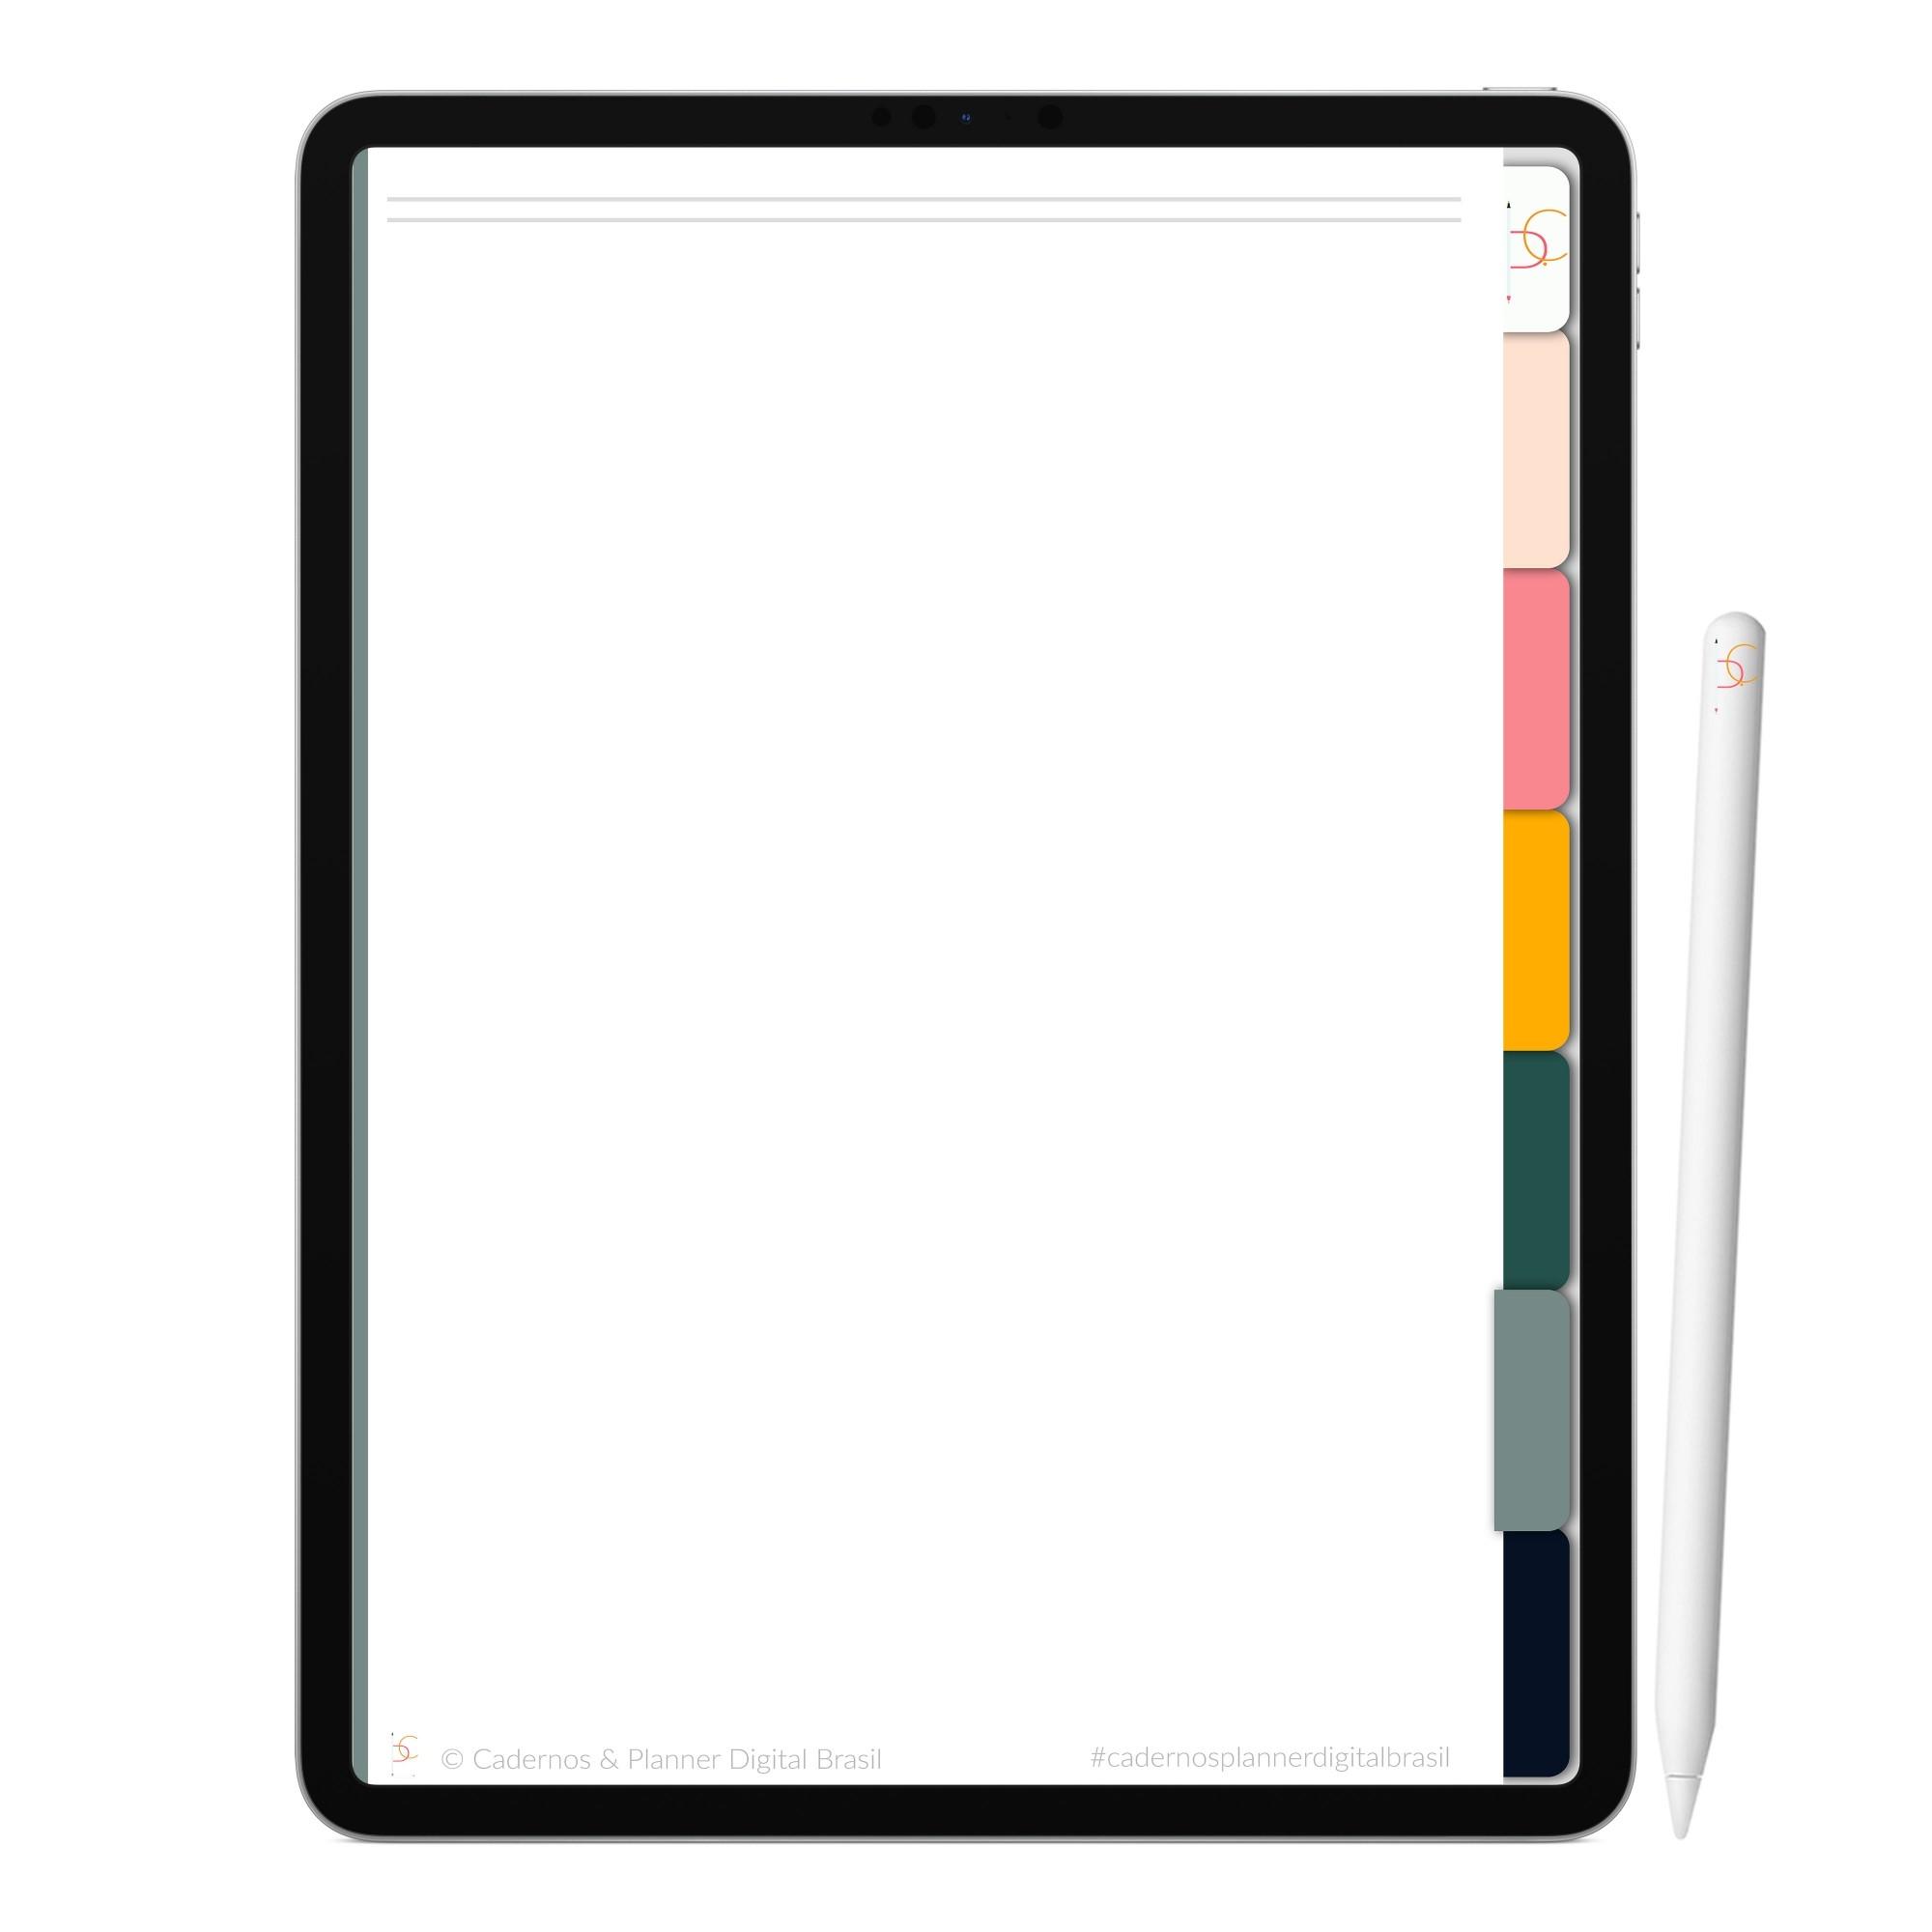 Caderno Digital Olive | Seis Divisórias Interativo| iPad Tablet | Download Instantâneo